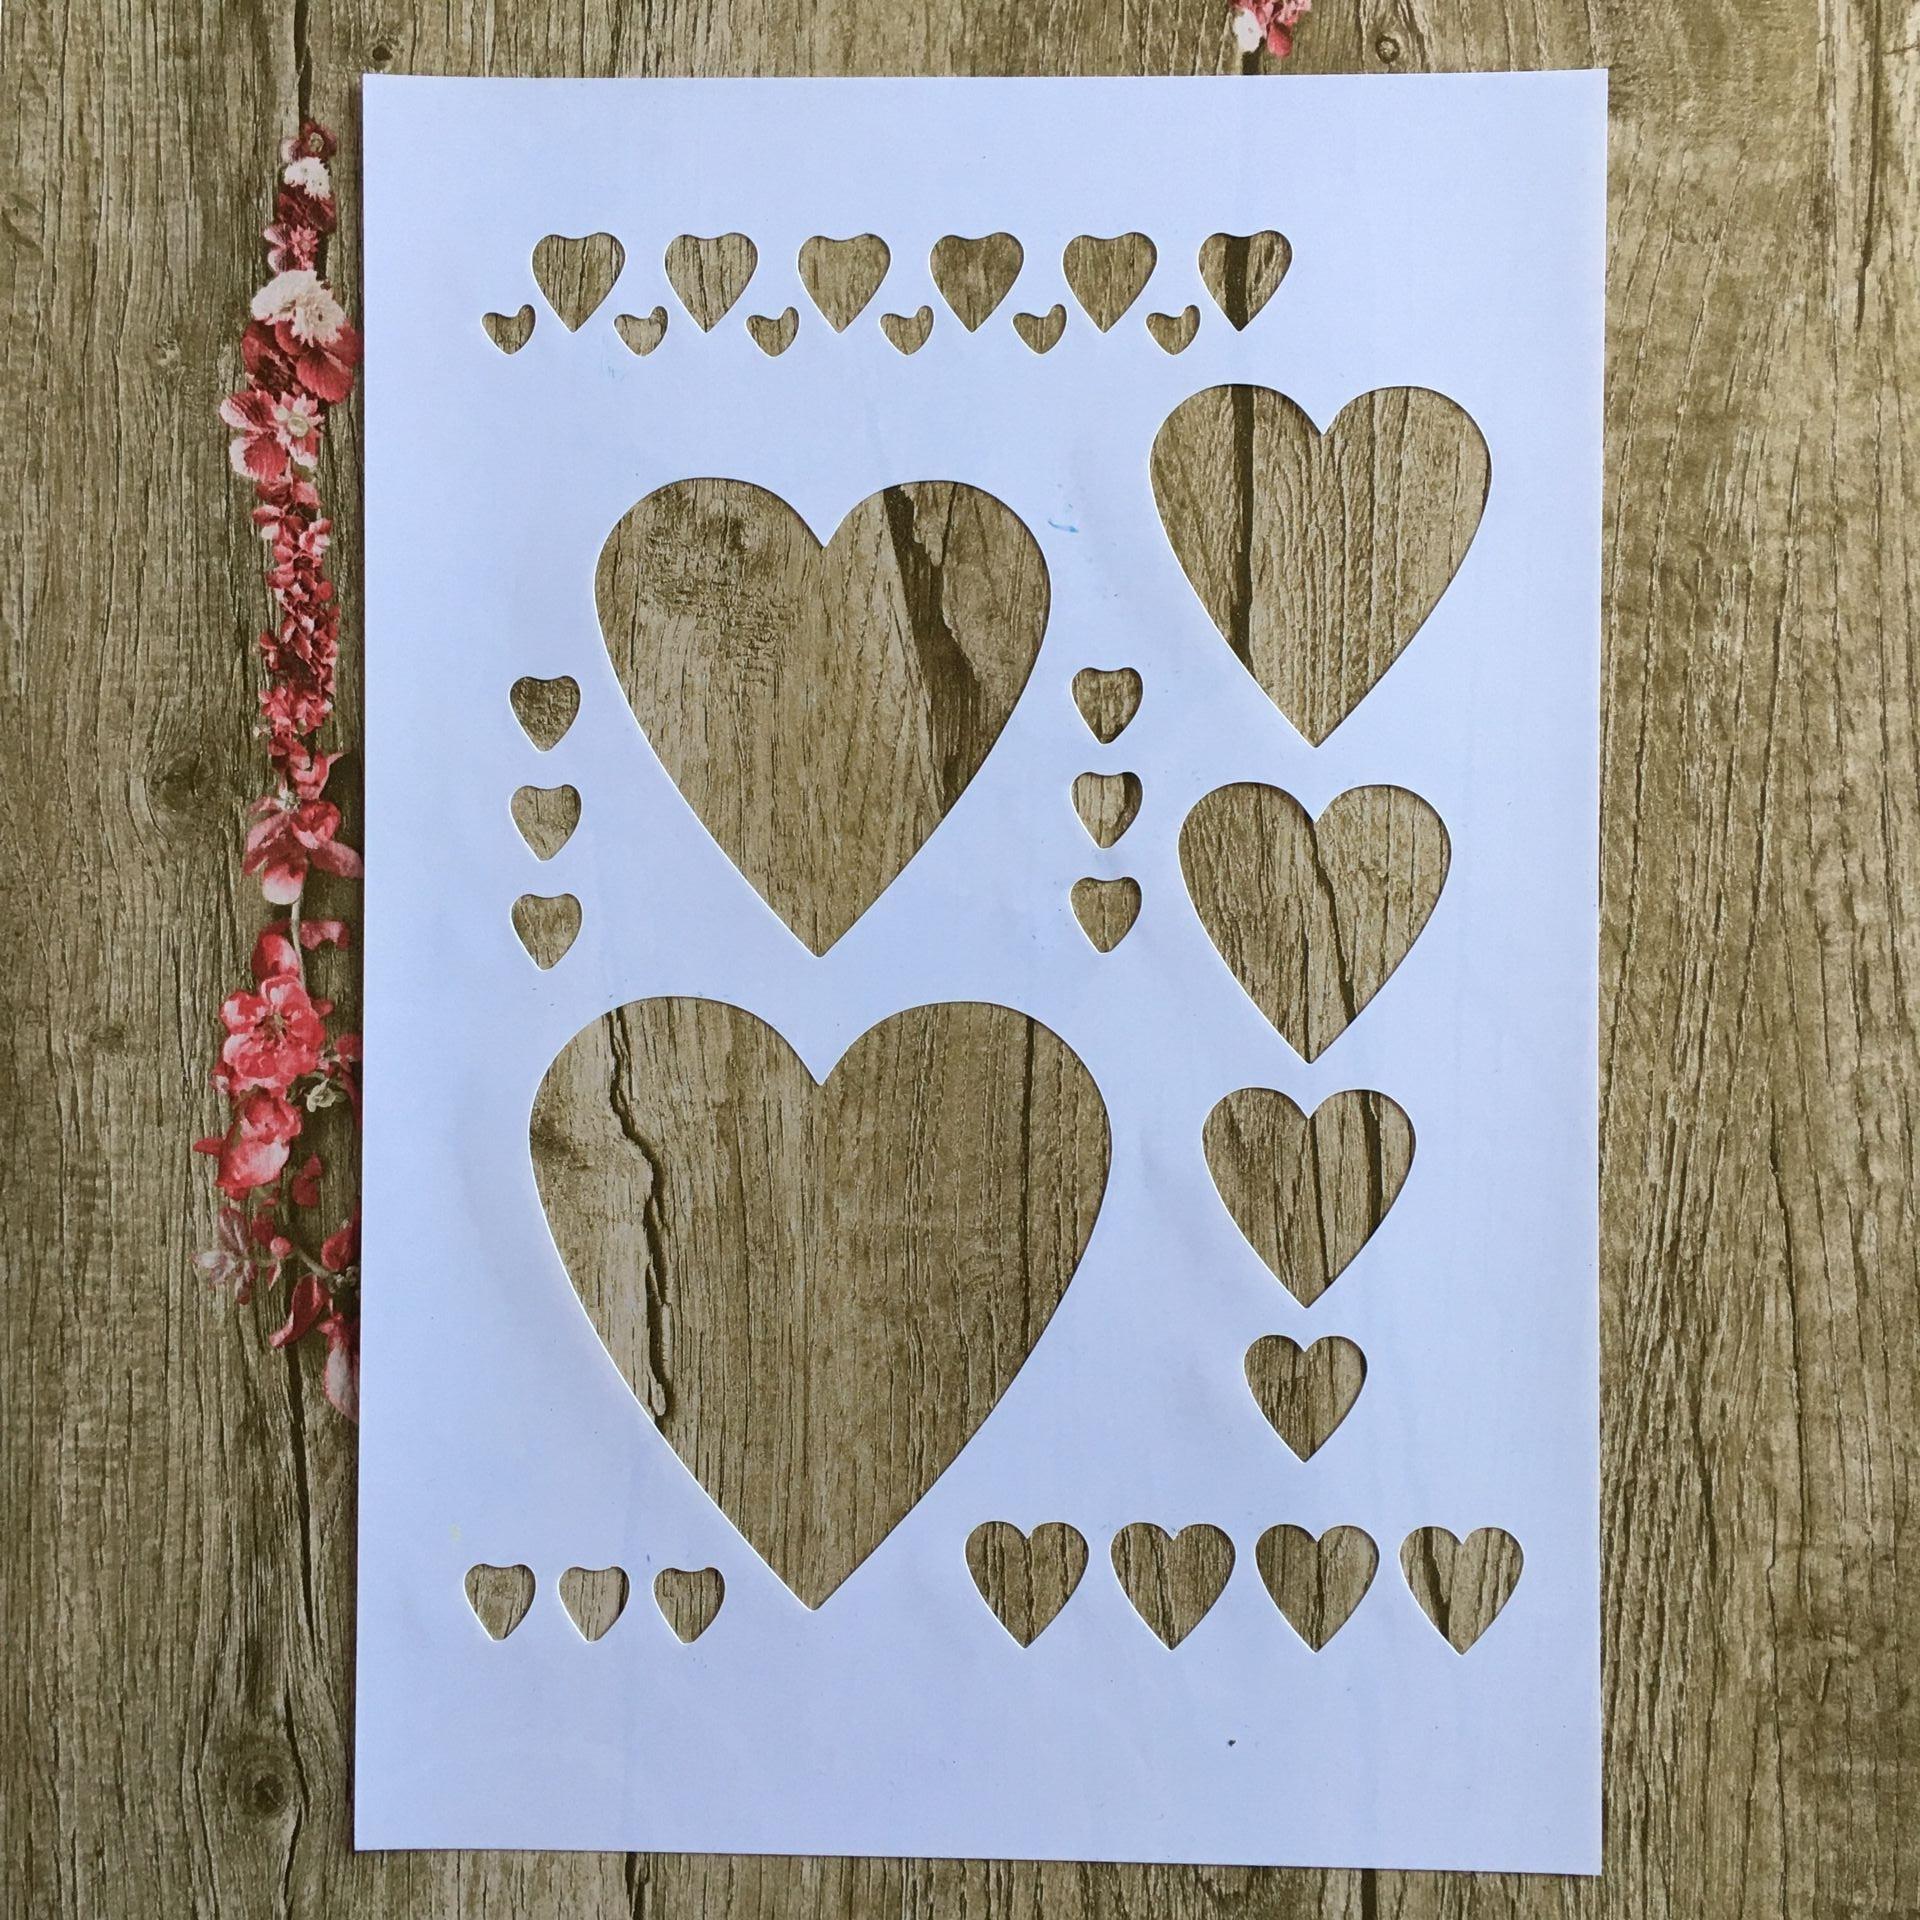 A4 29 * 21cm Heart Pentagram DIY Stencils Wall Painting Scrapbook Coloring Embossing Album Decorative Paper Card Template